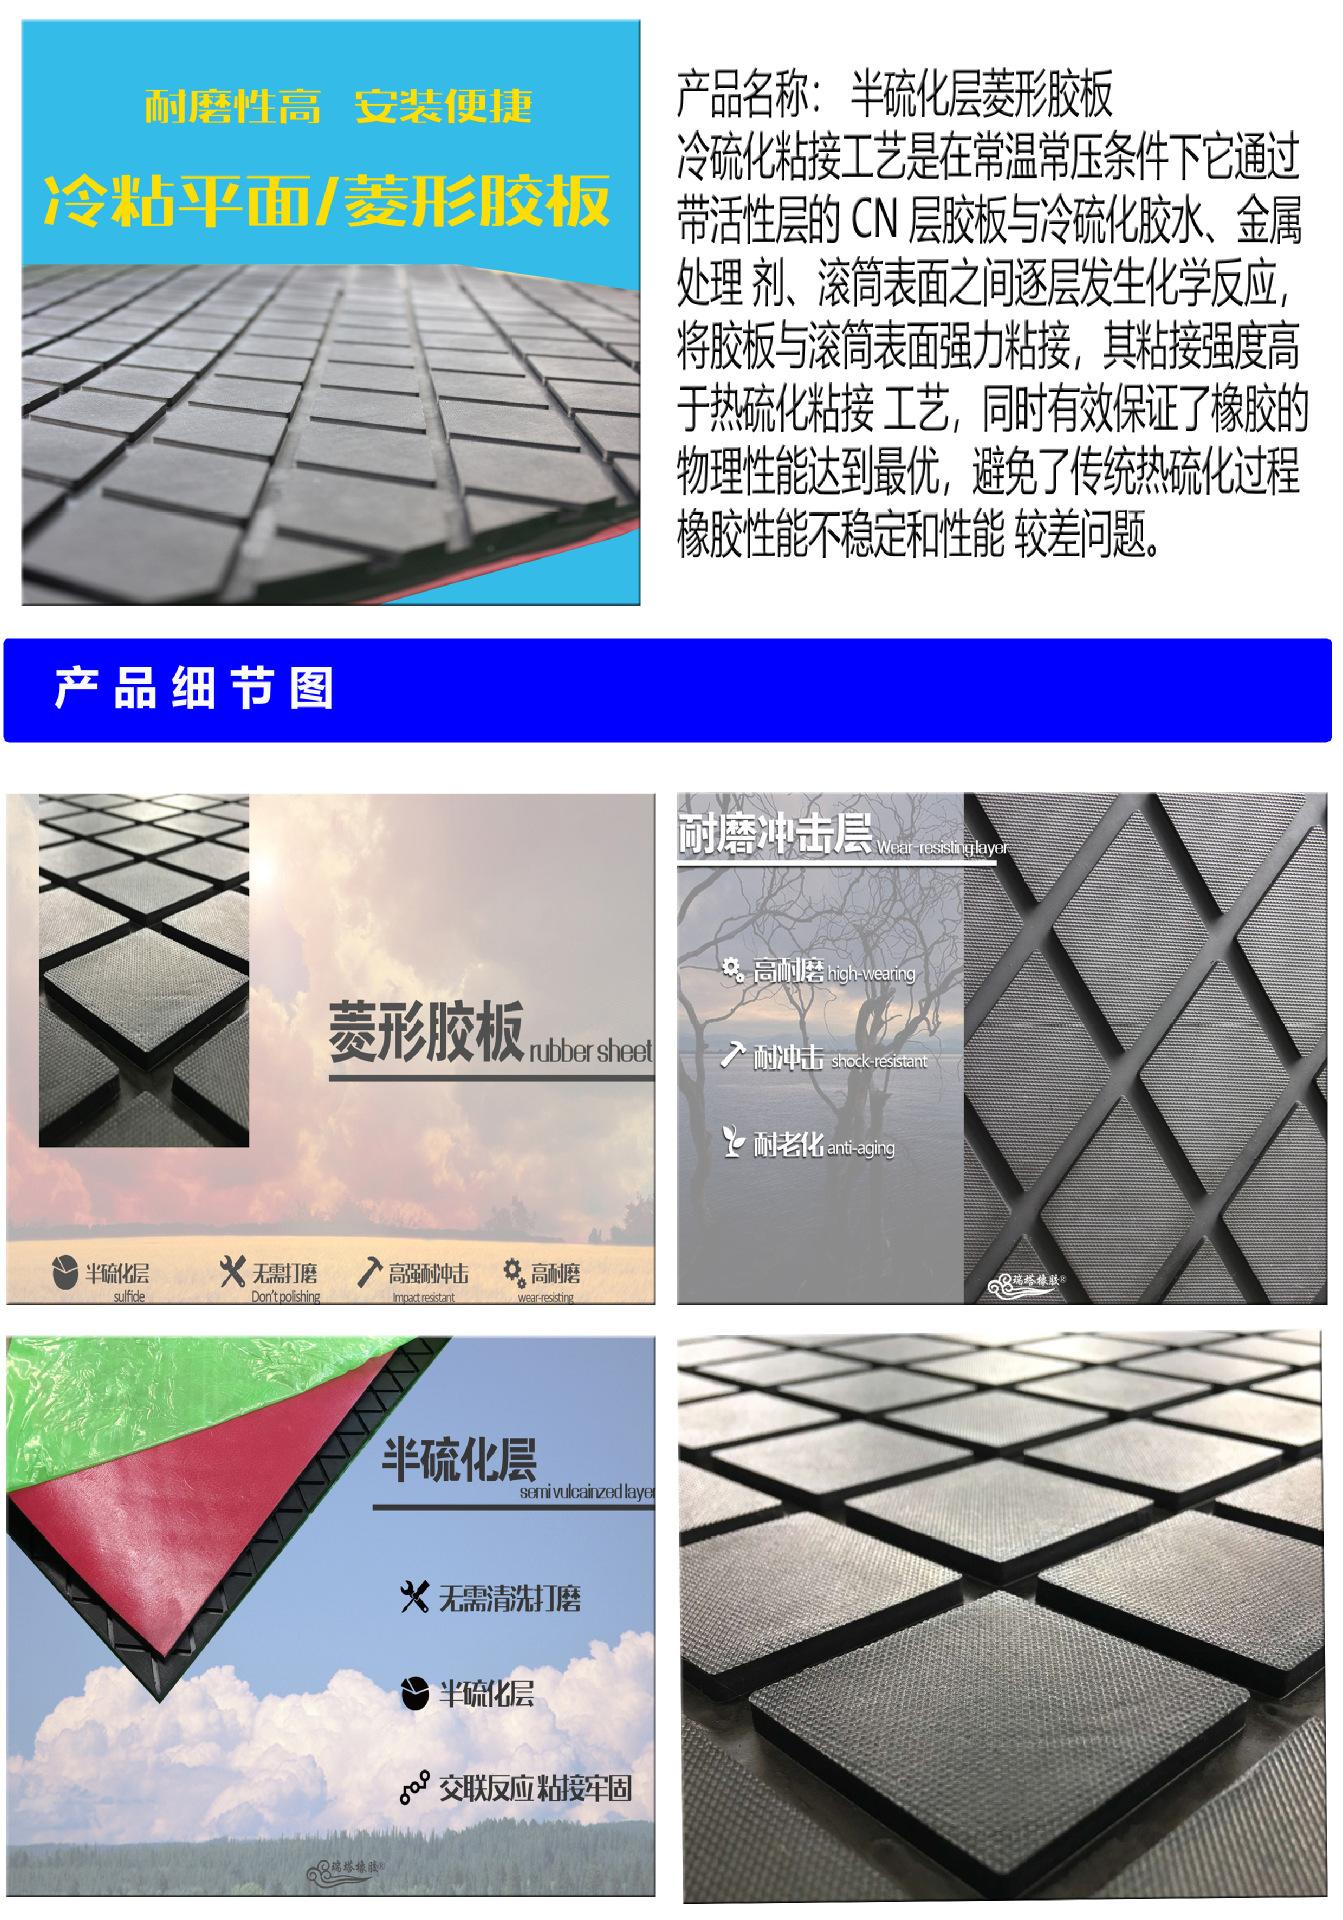 15mm冷粘耐磨胶板,冷硫化胶板,冷硫化滚筒包胶材料示例图1